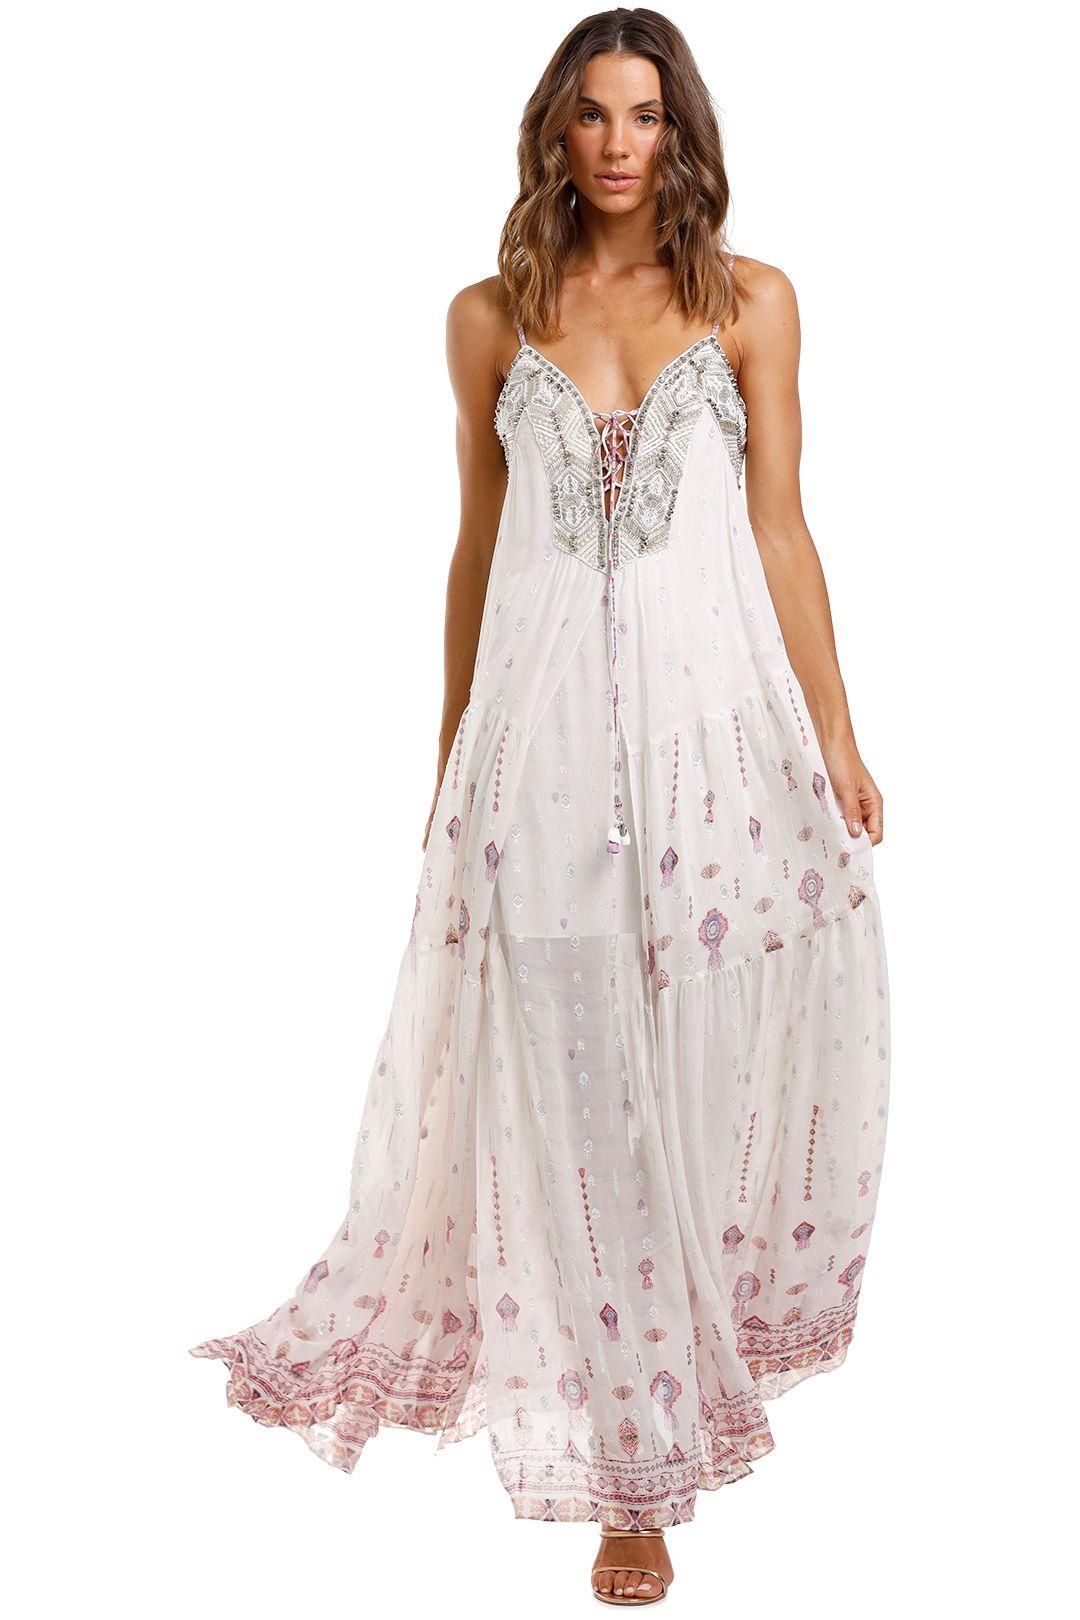 Camilla Lace Up Front Dress Tanami Road